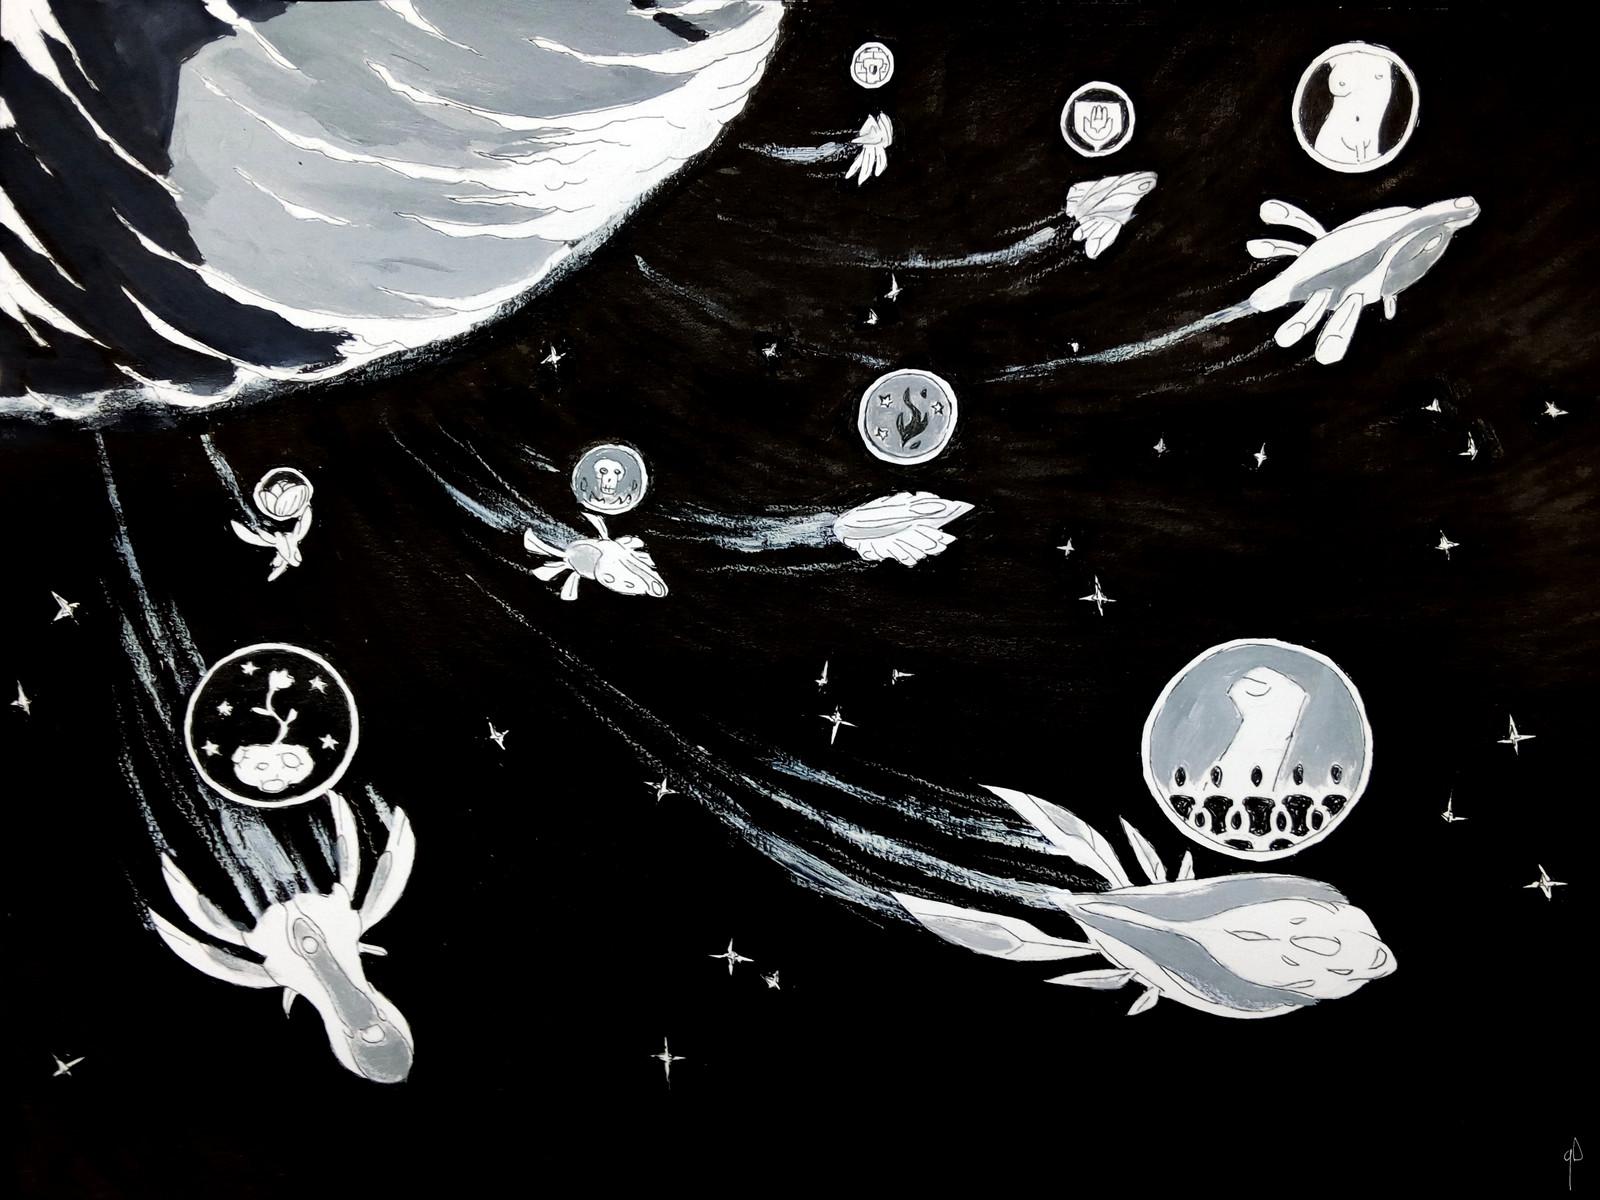 Earth's clans exodus